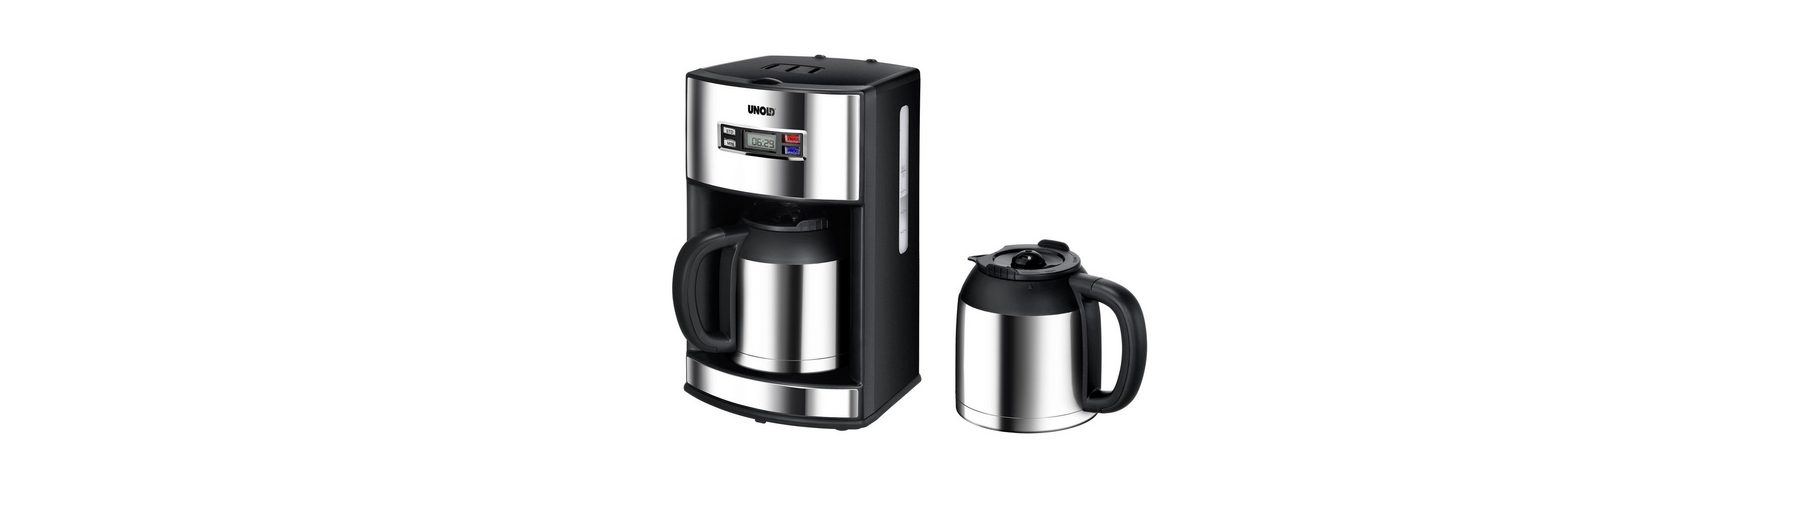 Unold Kaffeeautomat Digital 28465